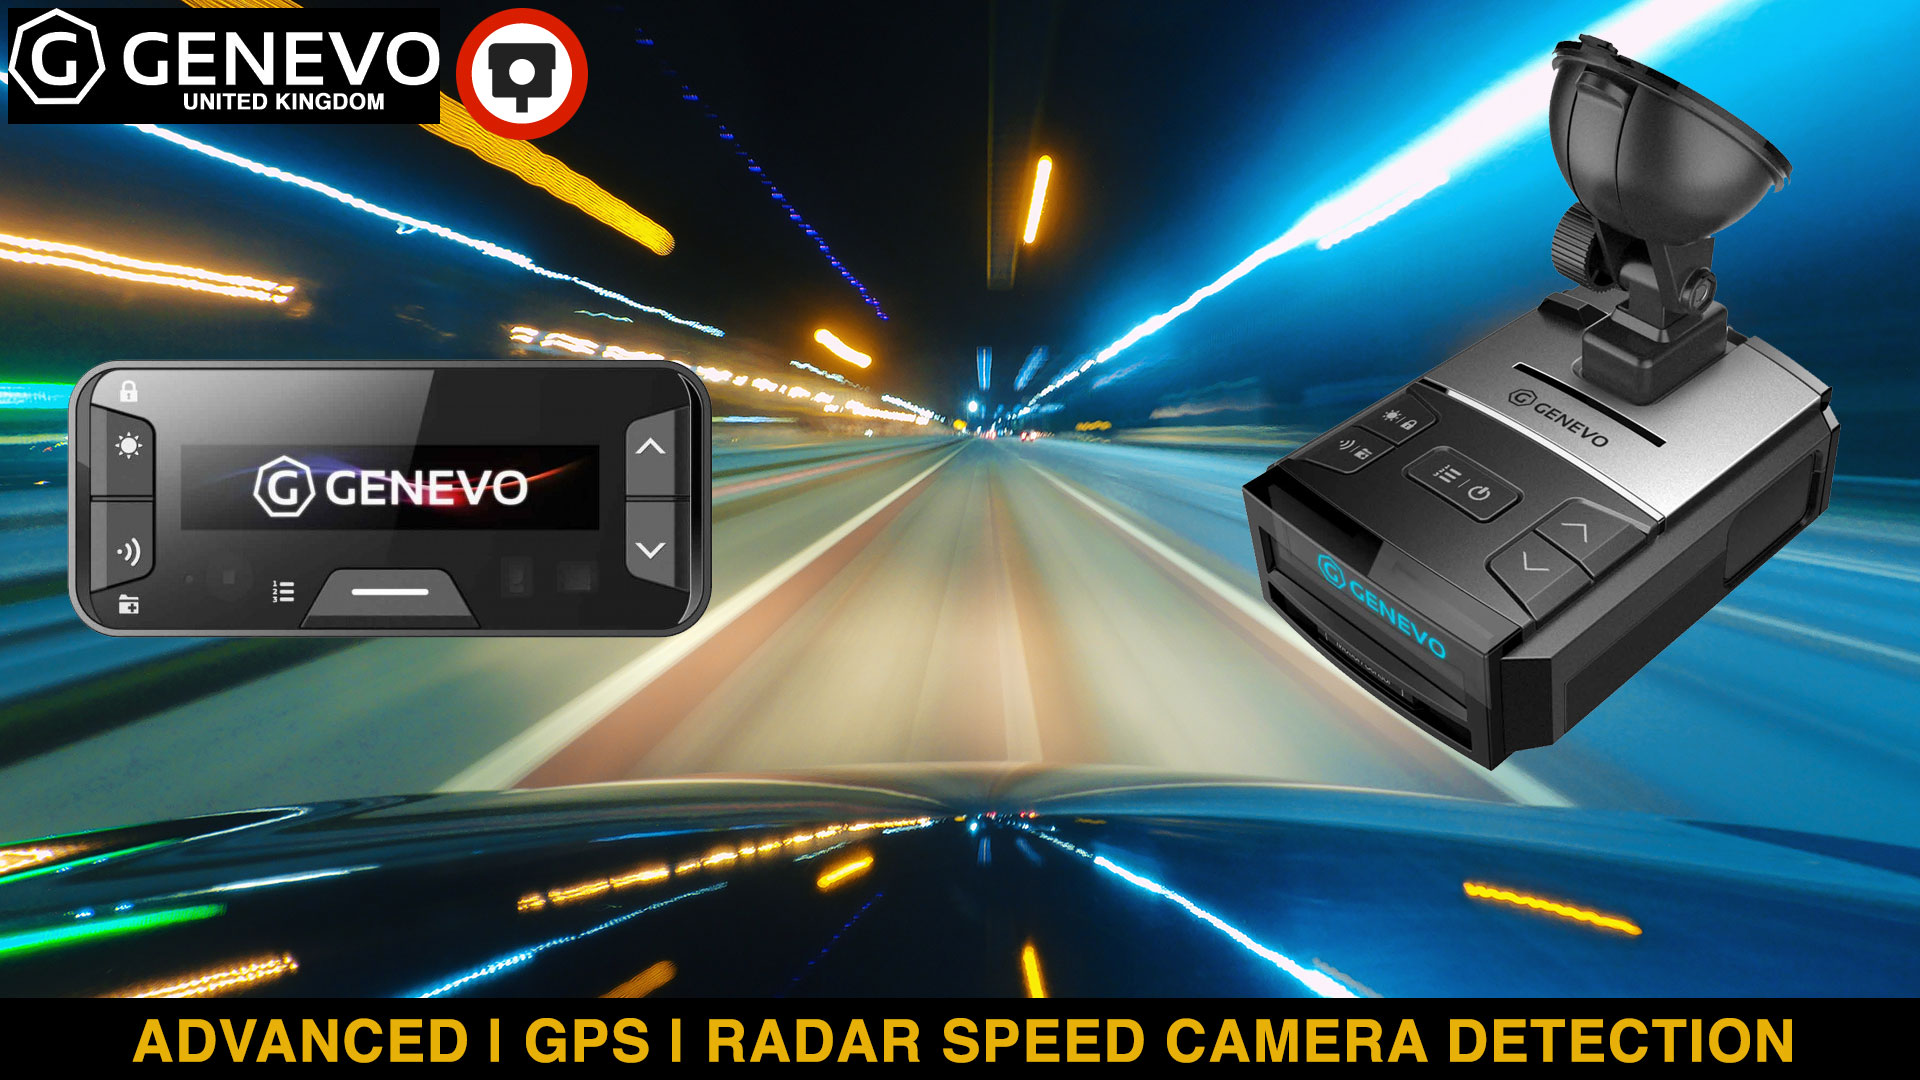 Genevo - Speed Camera Devices - Genevo MAX - Genevo Pro 2 - Genevo One M - Genevo One S